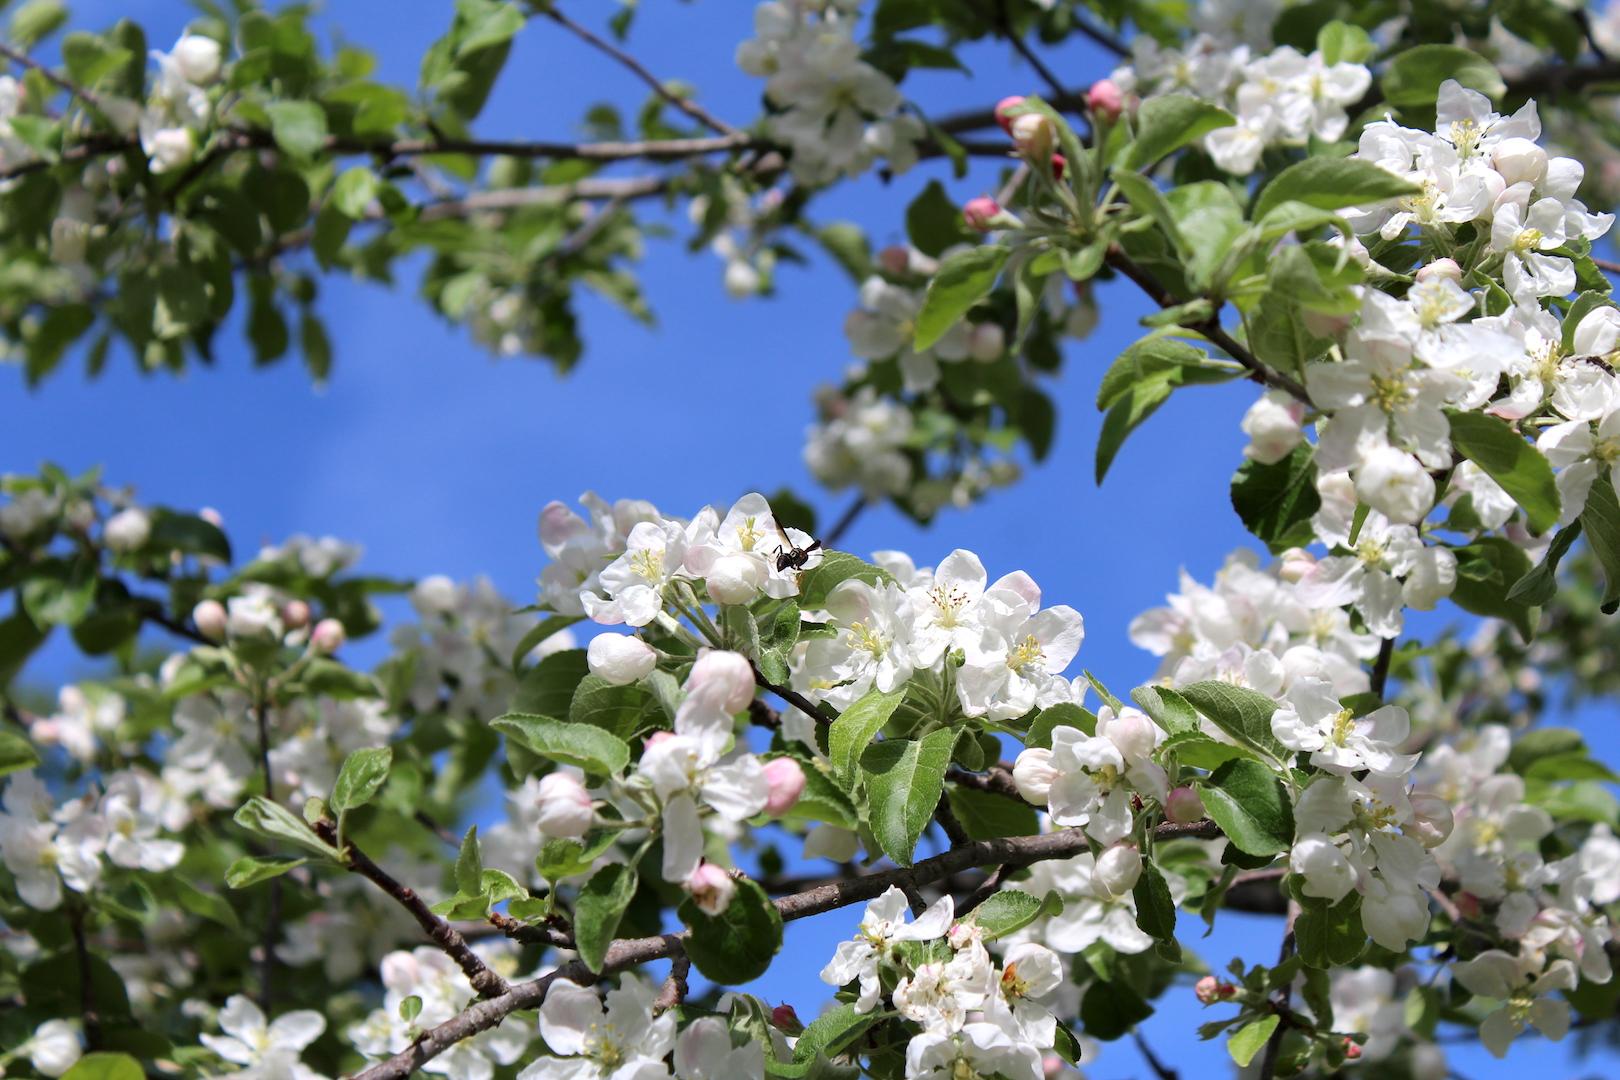 Apple Blossoms for Pollinators